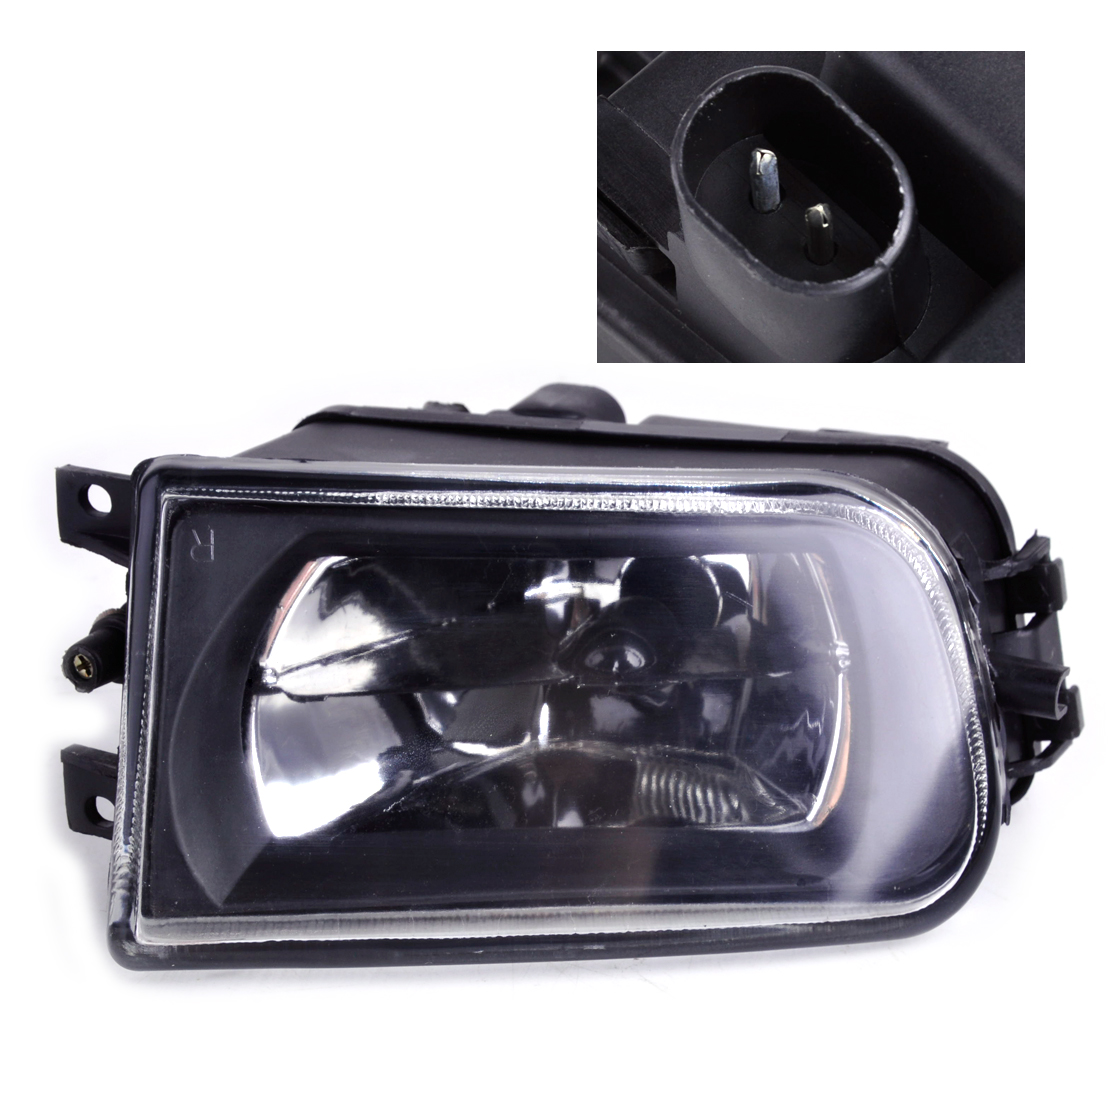 medium resolution of  2000 bmw 540i fuse box dwcx 63178360576 right fog light lamp for bmw e36 z3